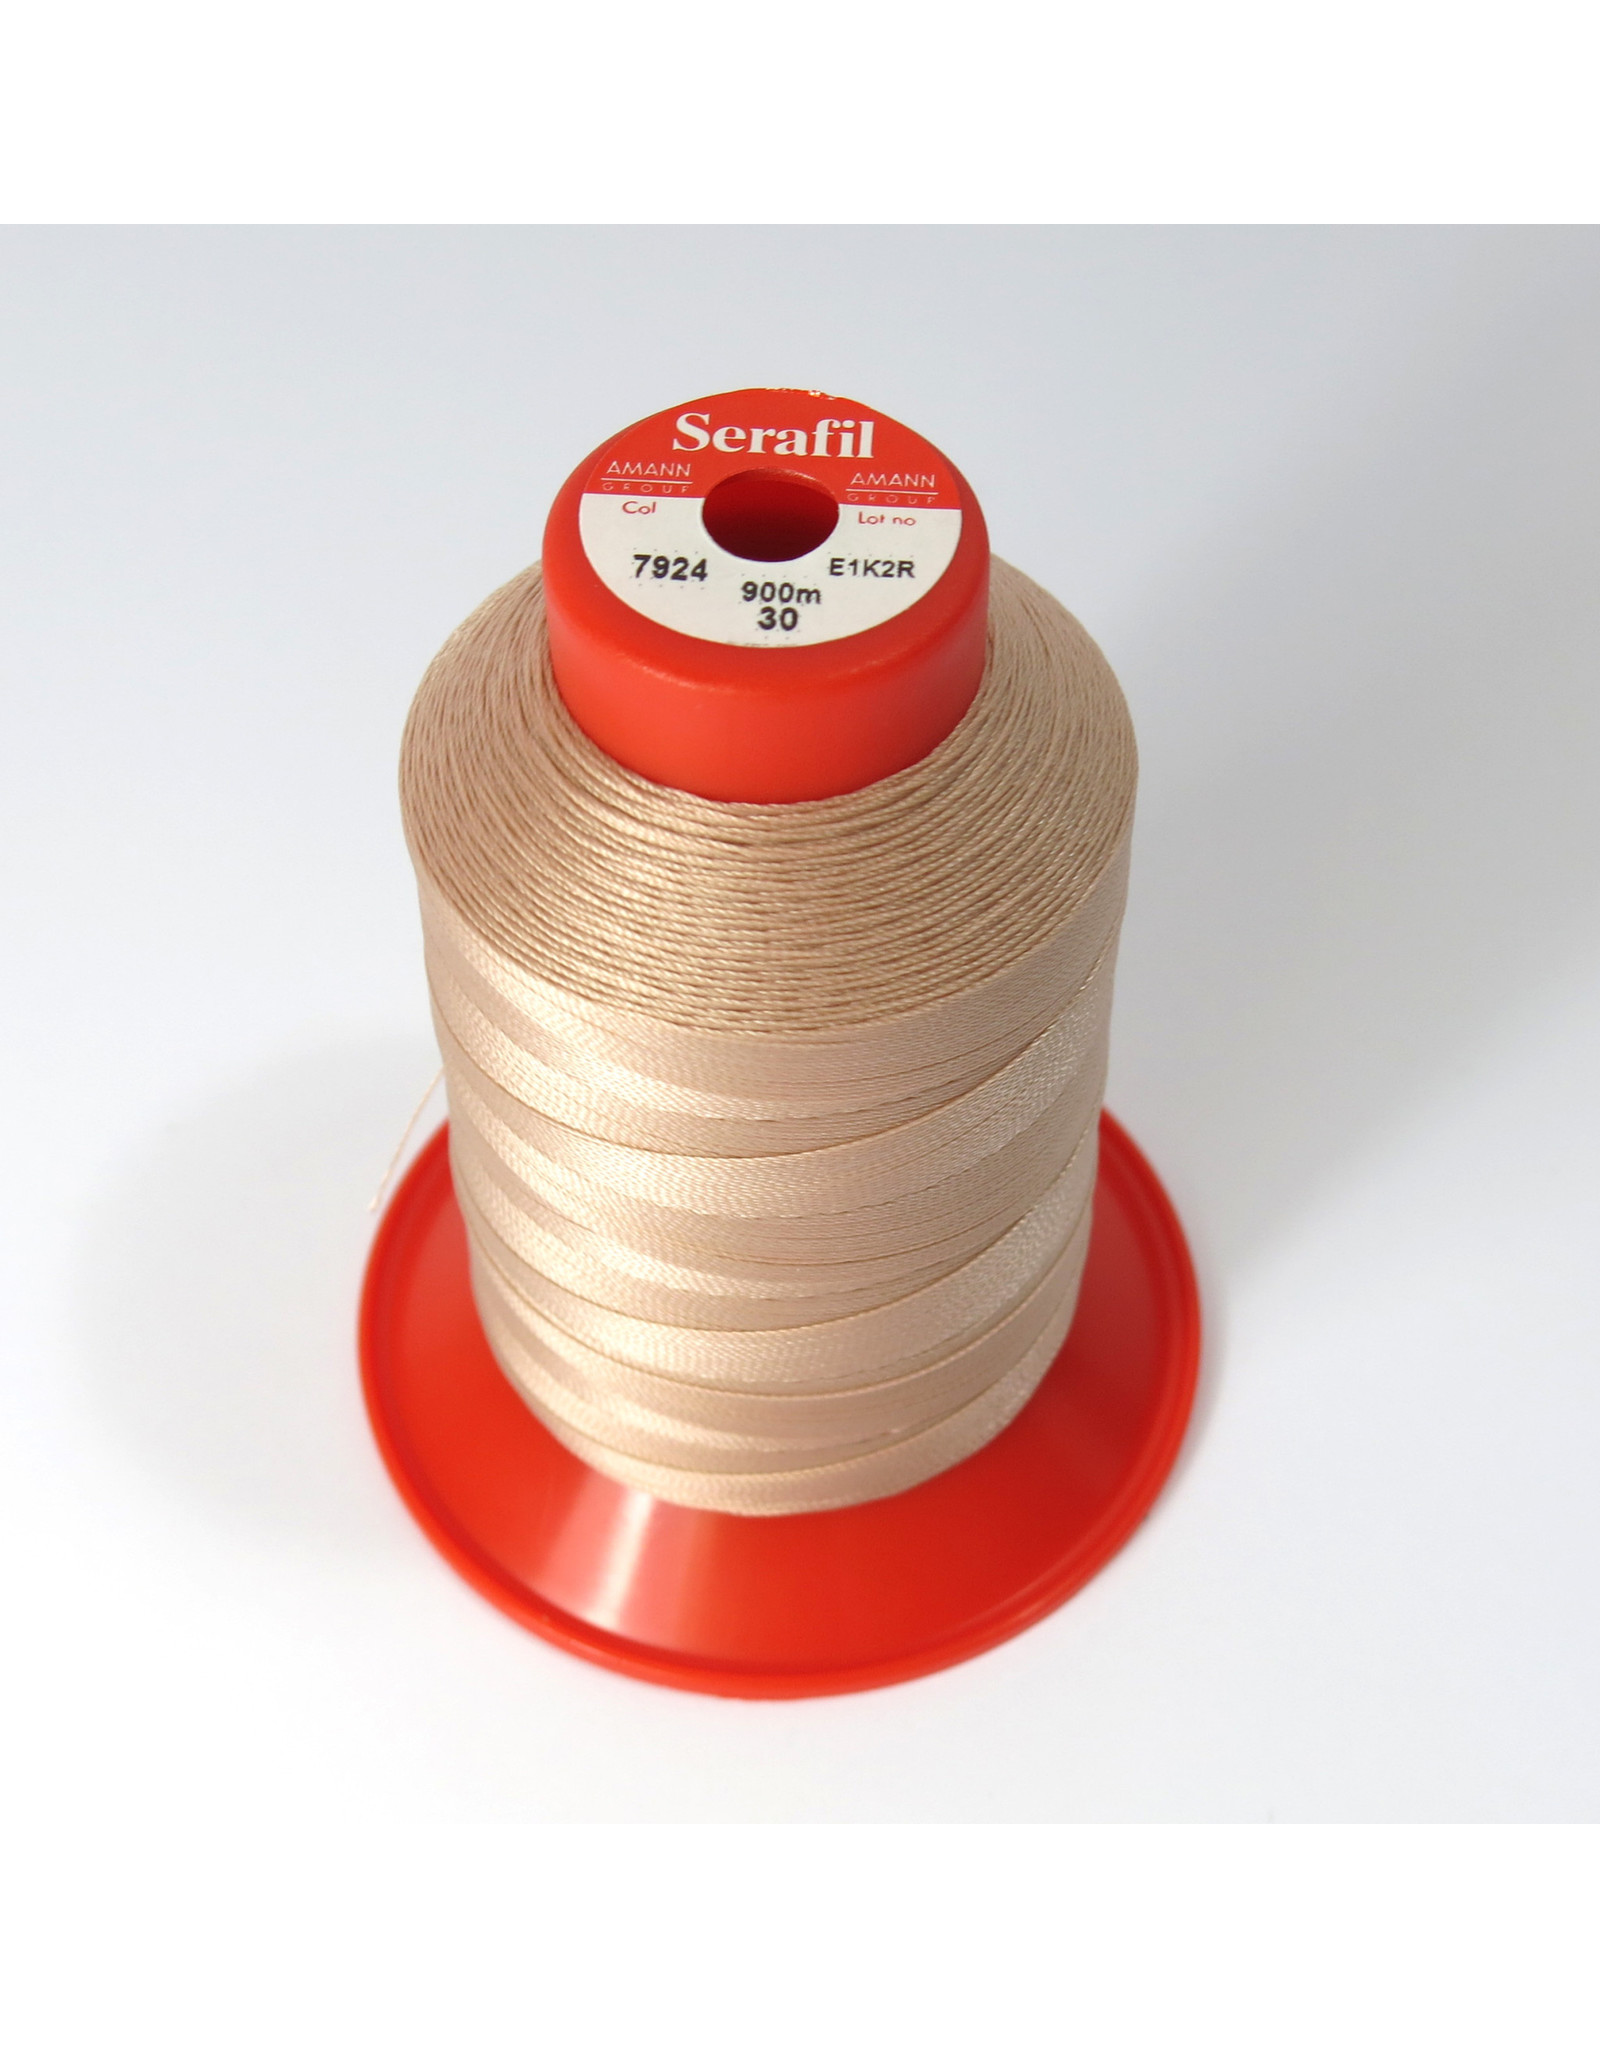 Serafil machine sewing threads 7924